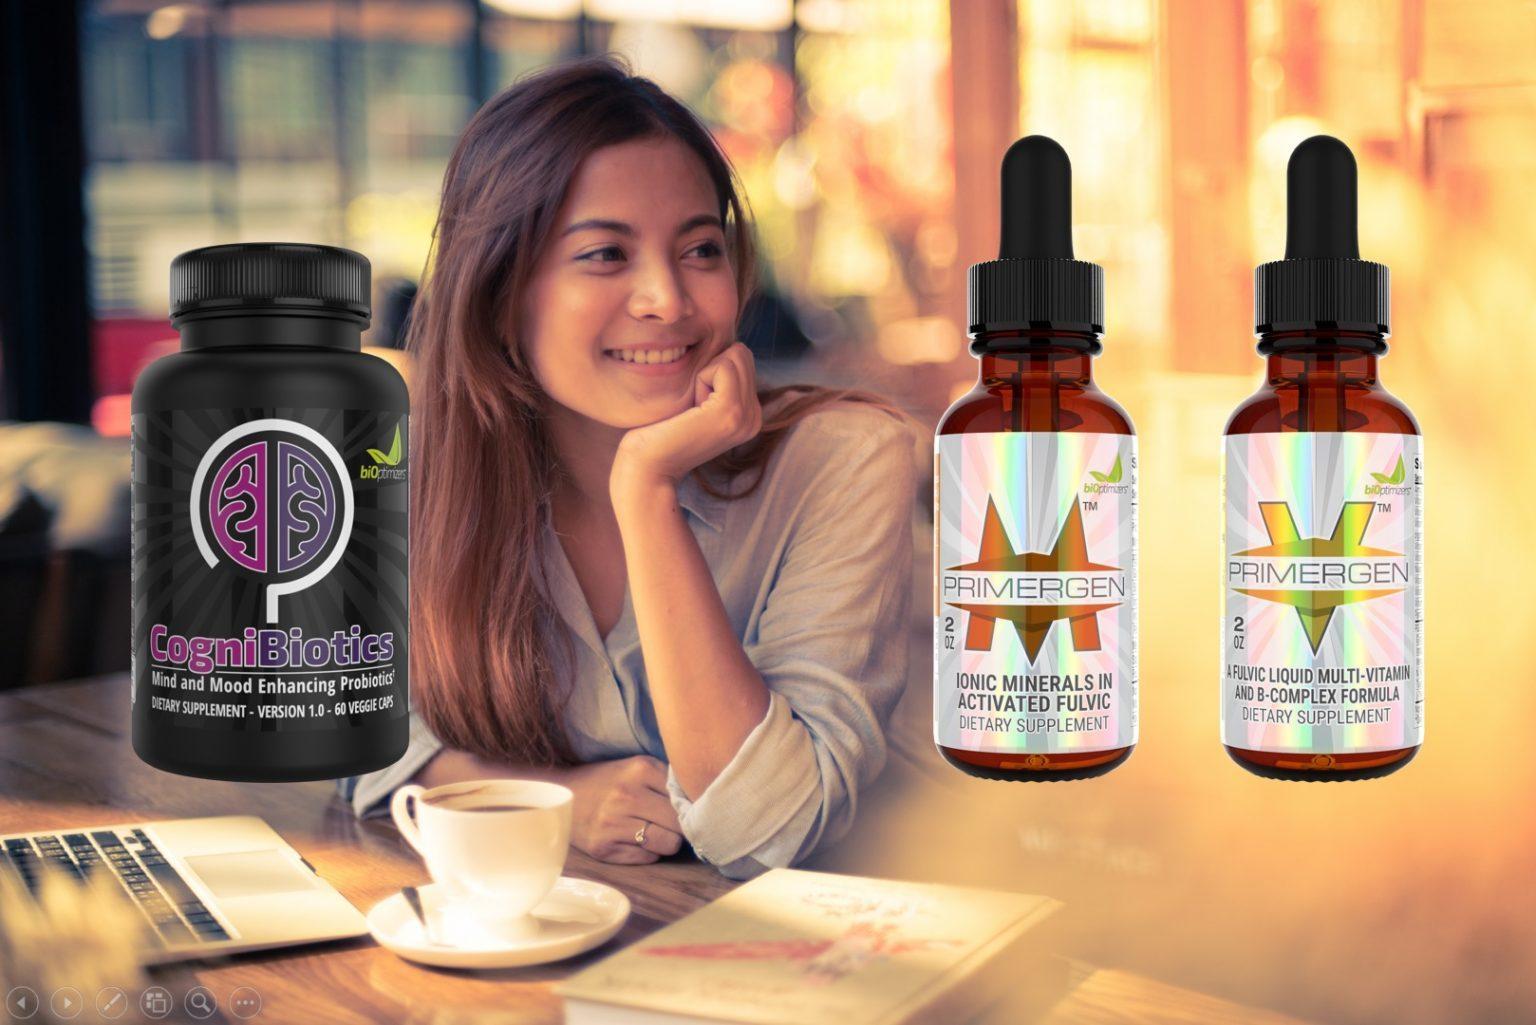 Brain health products